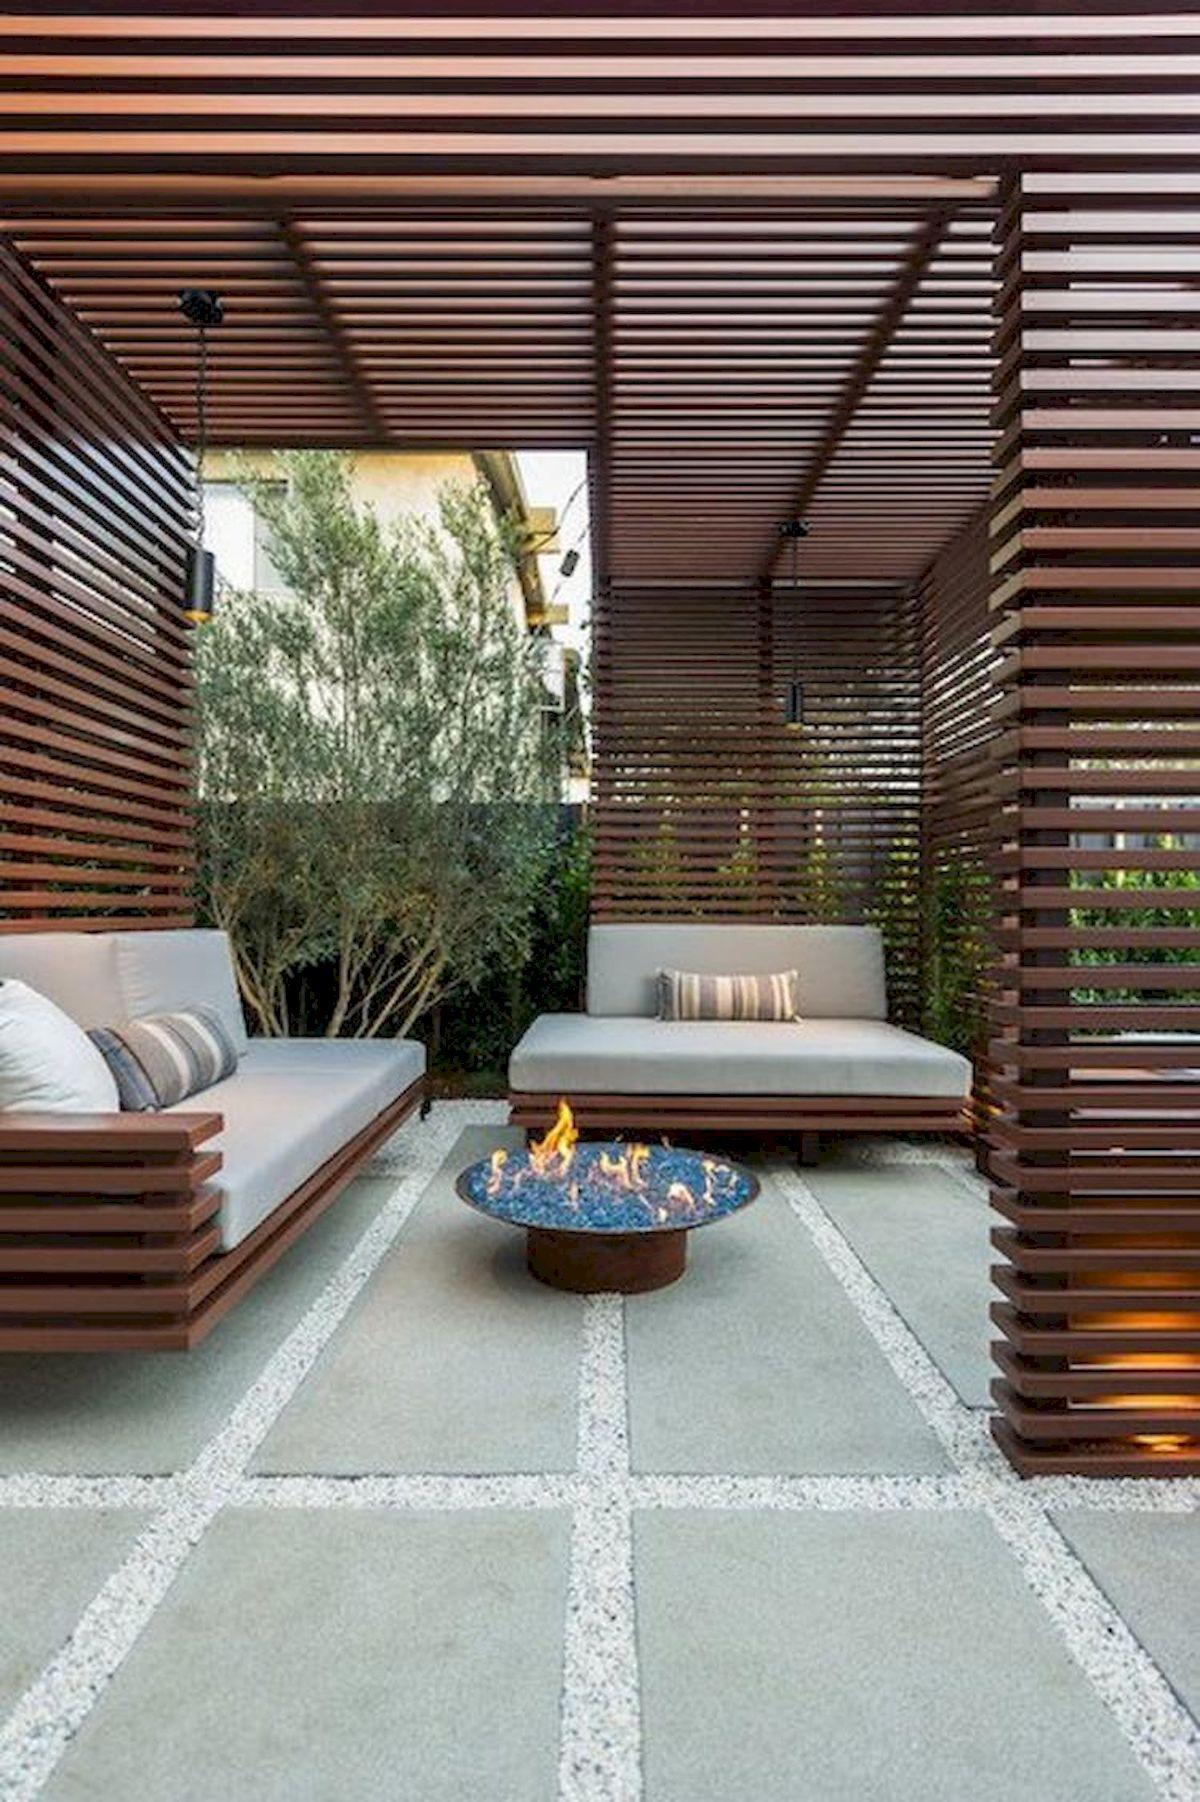 60 Awesome DIY Backyard Privacy Design And Decor Ideas (43)